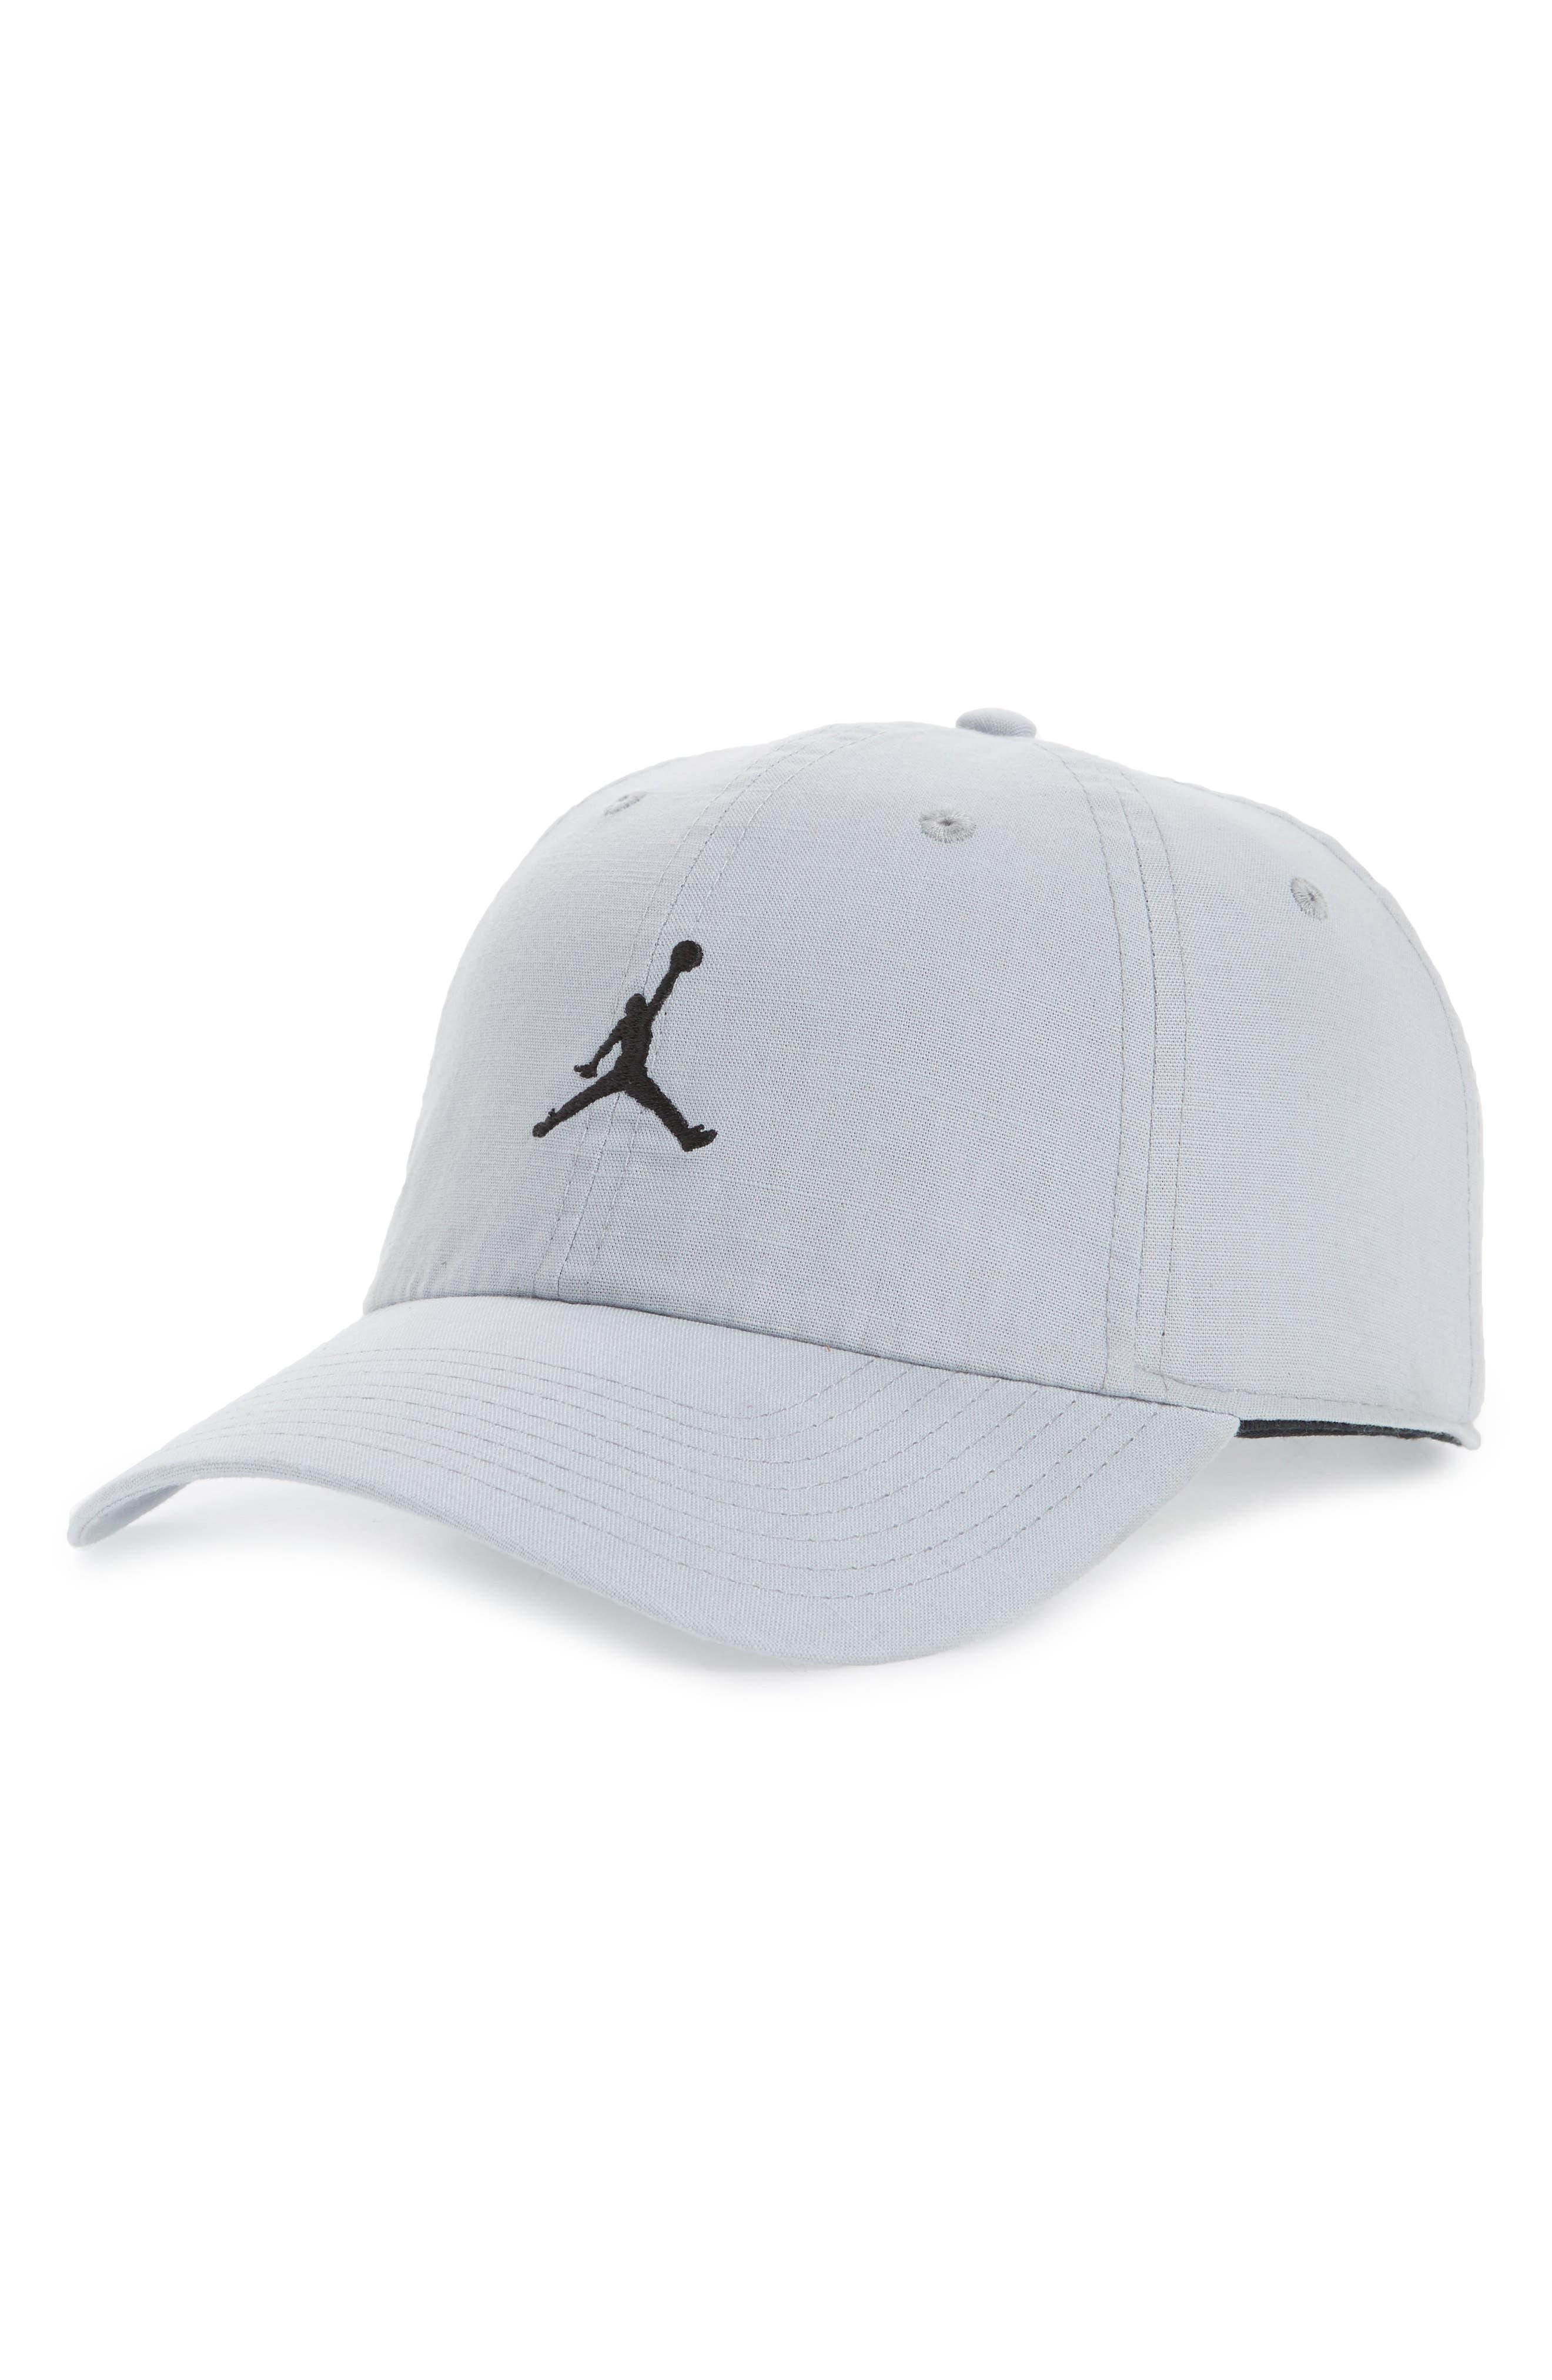 Main Image - Nike Jordan H86 Jumpman Washed Baseball Cap